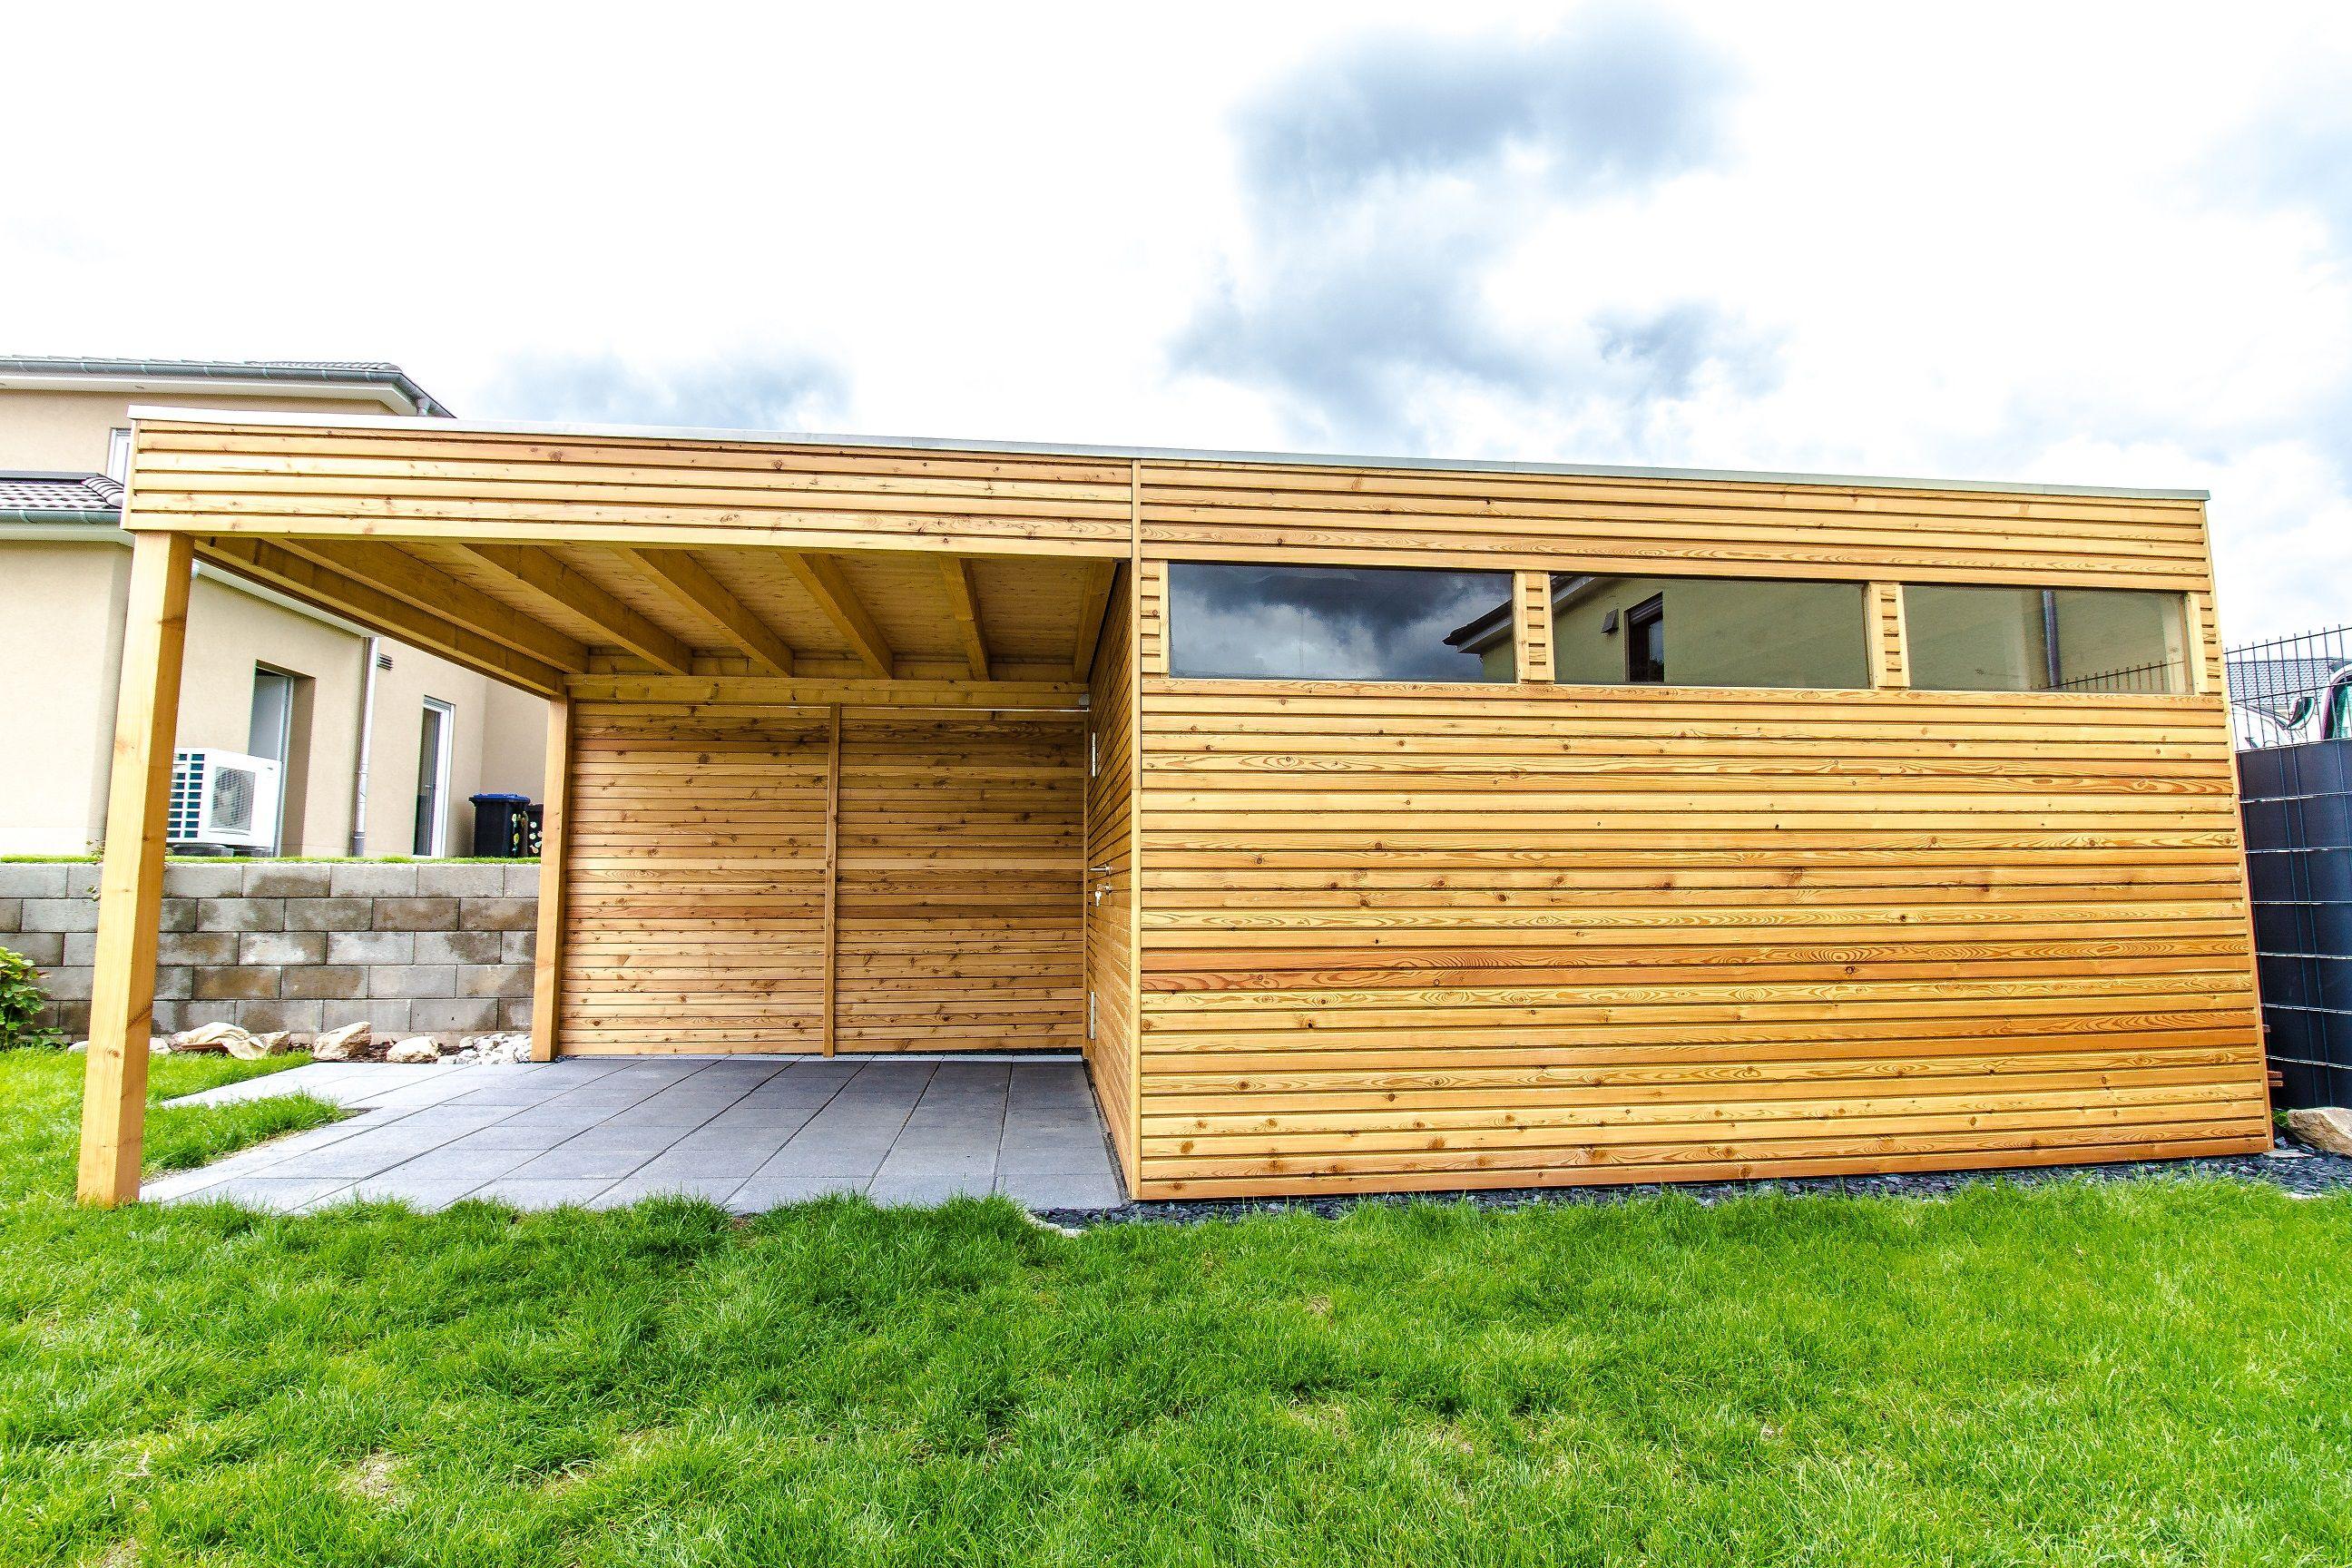 Design Gartenhaus Geratehaus Gartenhaus Gartenhaus Modern Design Gartenhaus